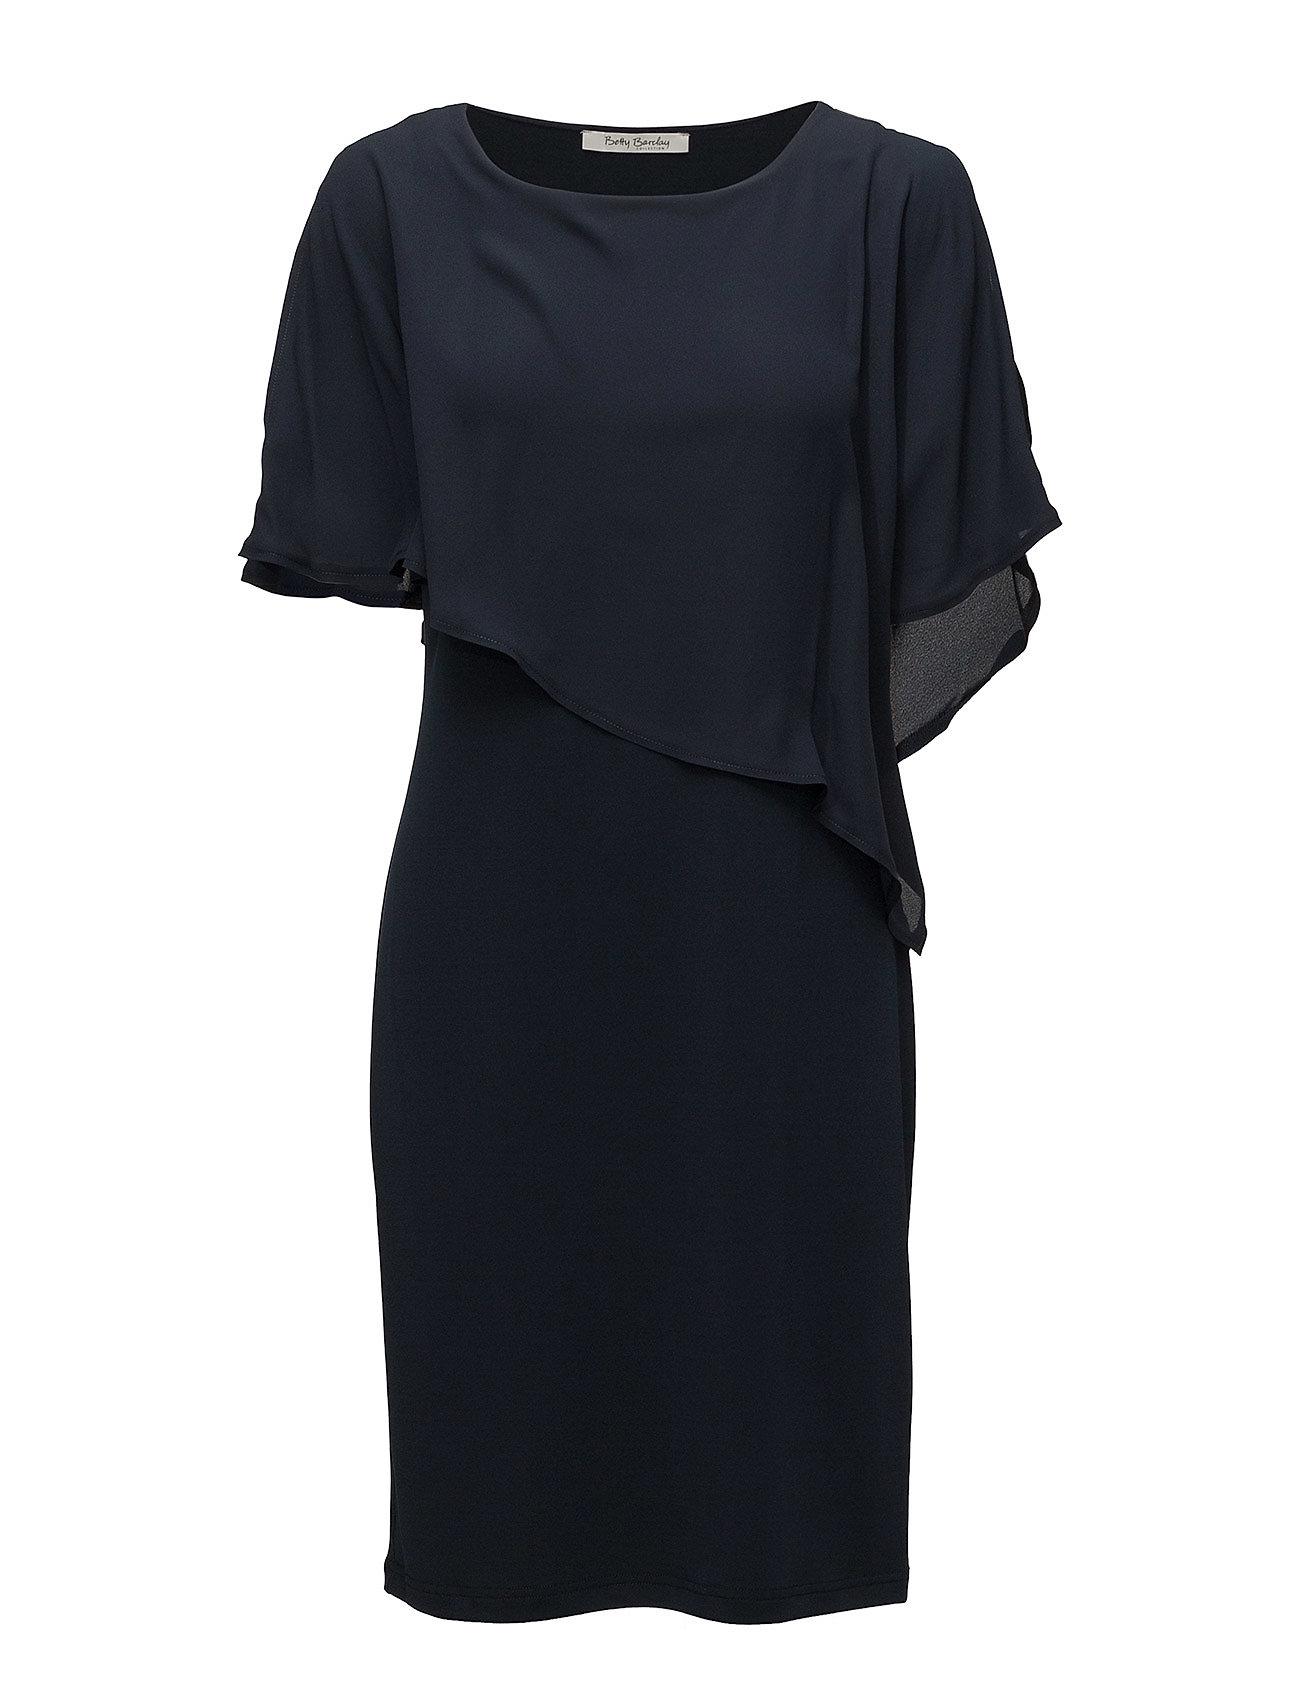 dress short 1 2 sleeve dark sky betty. Black Bedroom Furniture Sets. Home Design Ideas